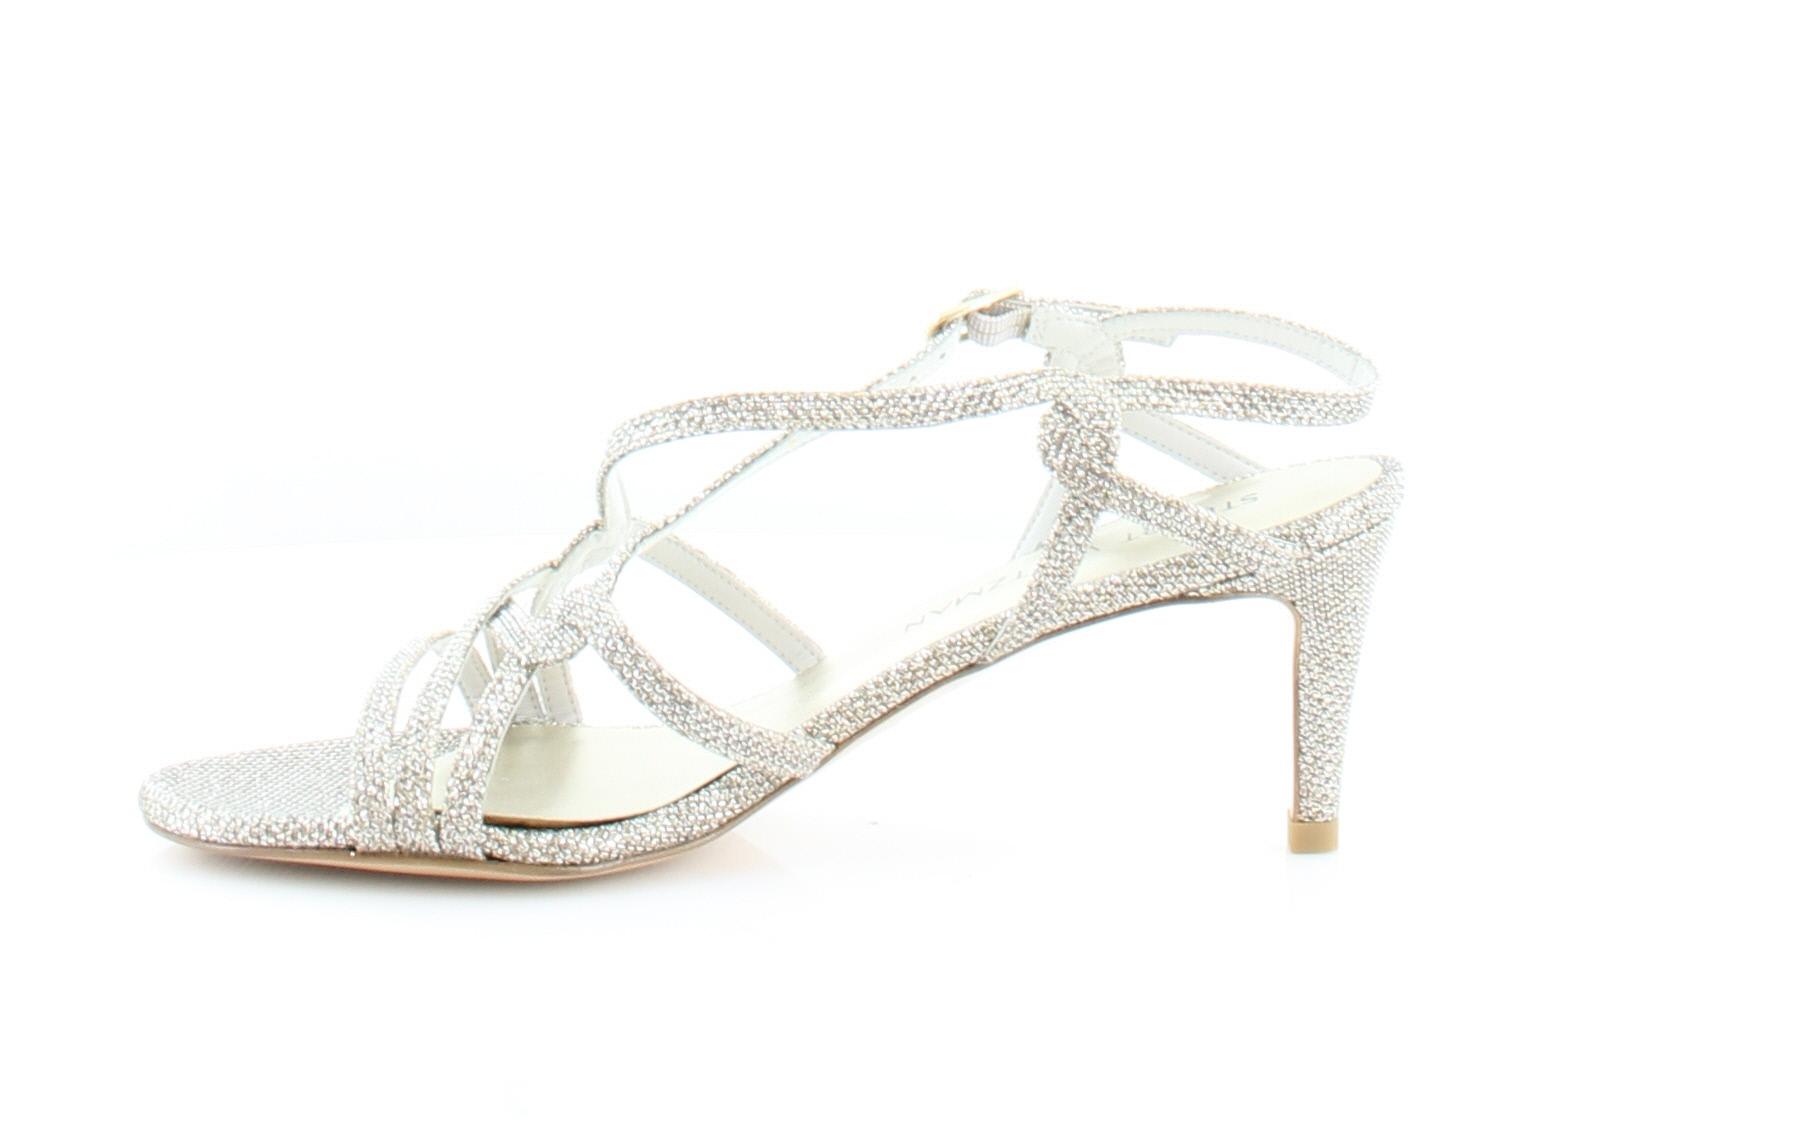 Stuart Weitzman On My Way Women's Sandals & Flip Flops Platinum Size 7.5 M